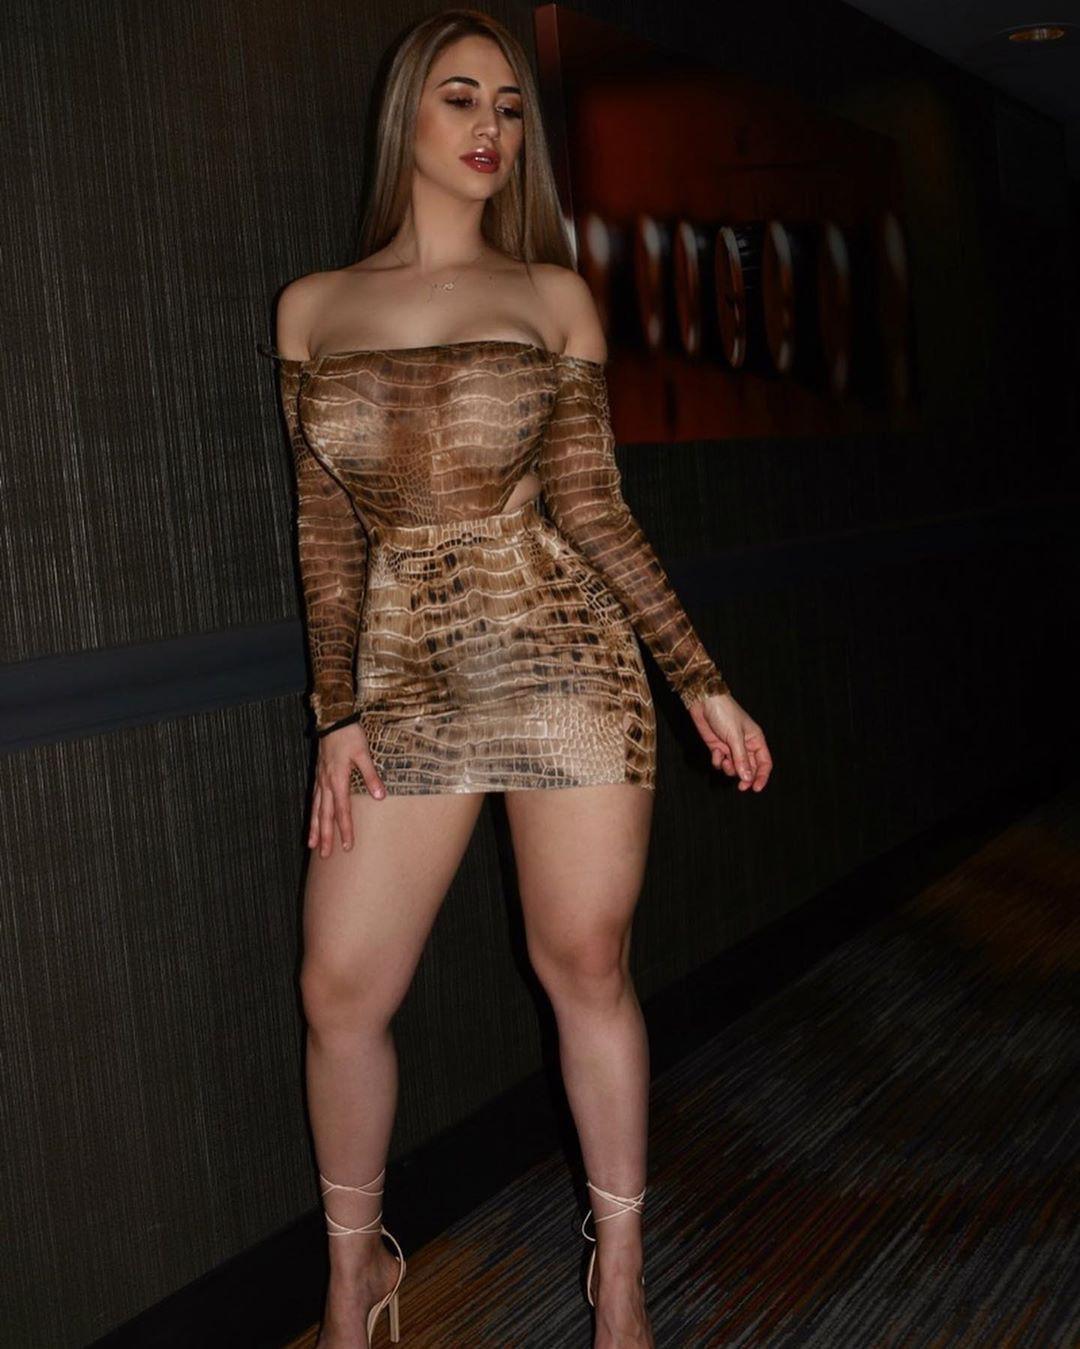 Mariam Olivera dresses ideas, smooth thigh pics, legs pic